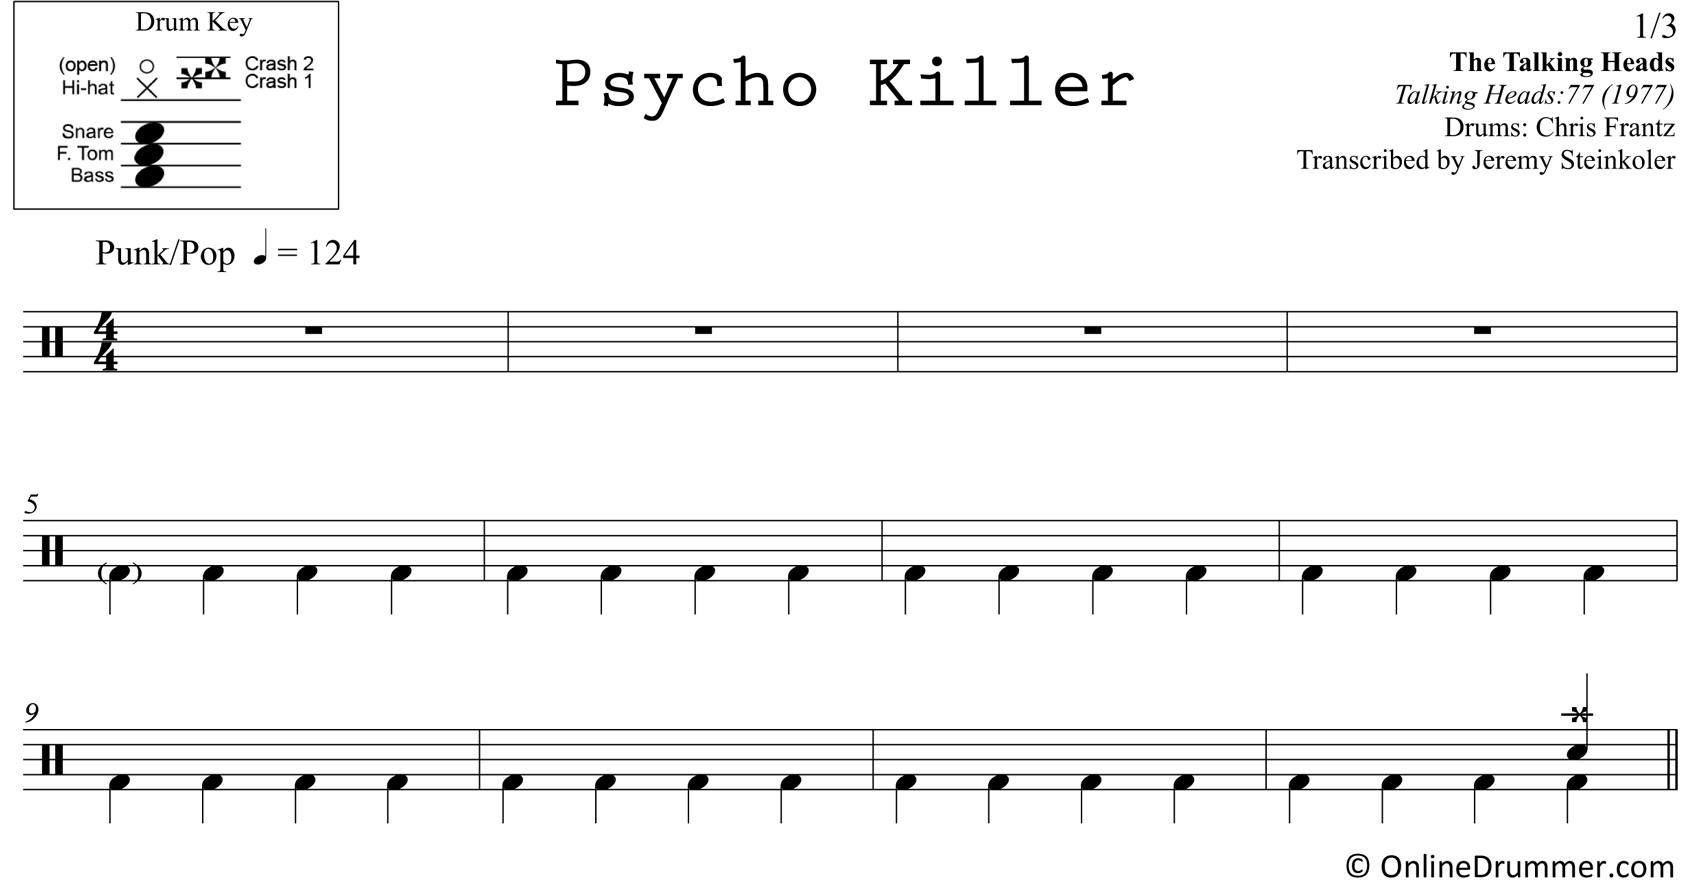 Psycho Killer - Talking Heads - Drum Sheet Music